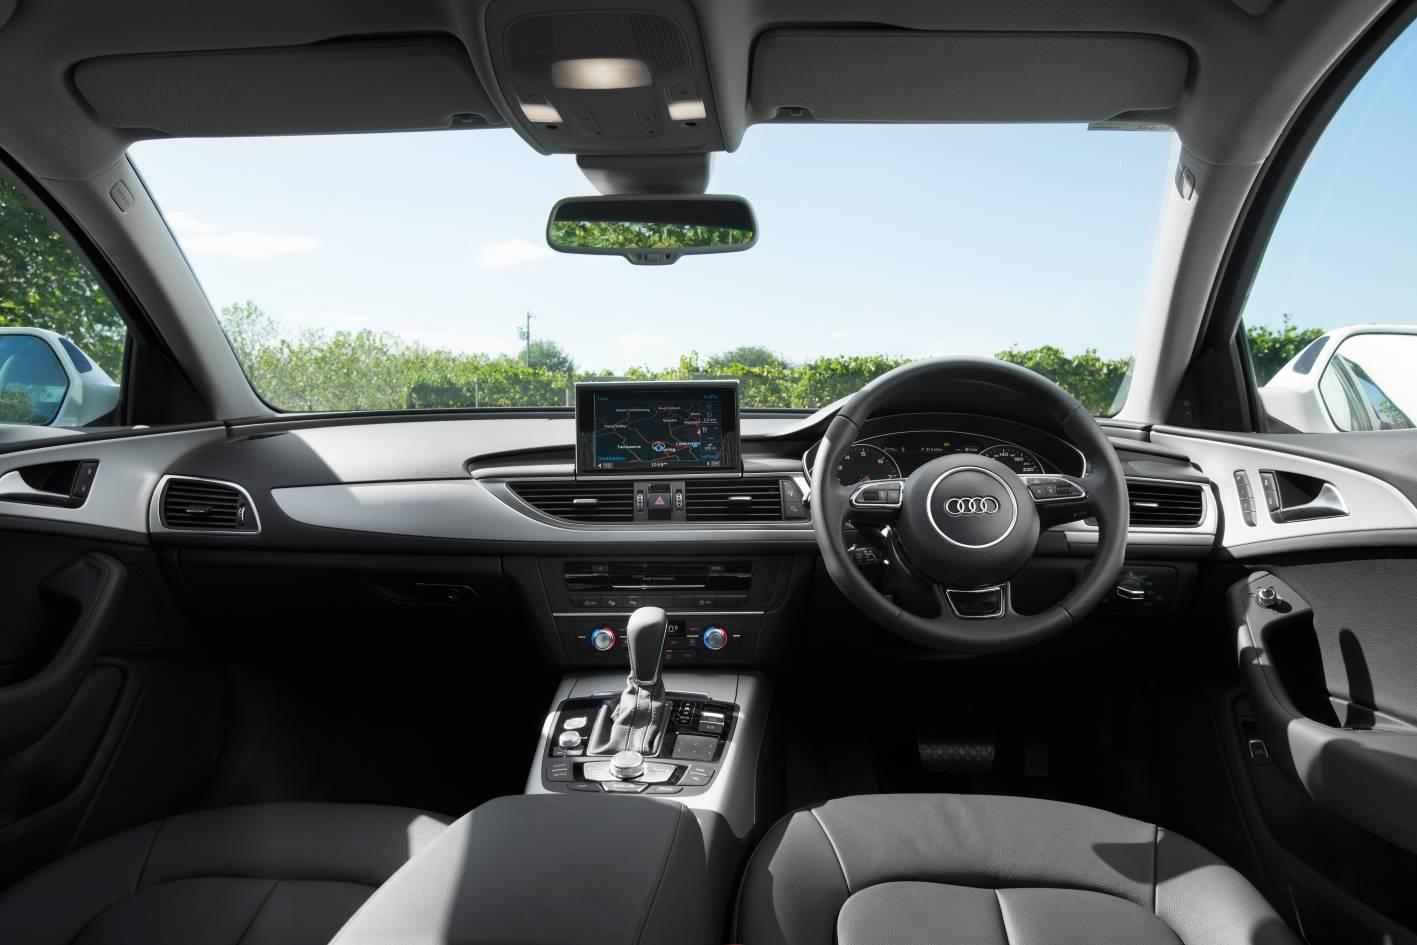 audi 2015 a6 interior. 2015audia6faceliftinterior audi 2015 a6 interior